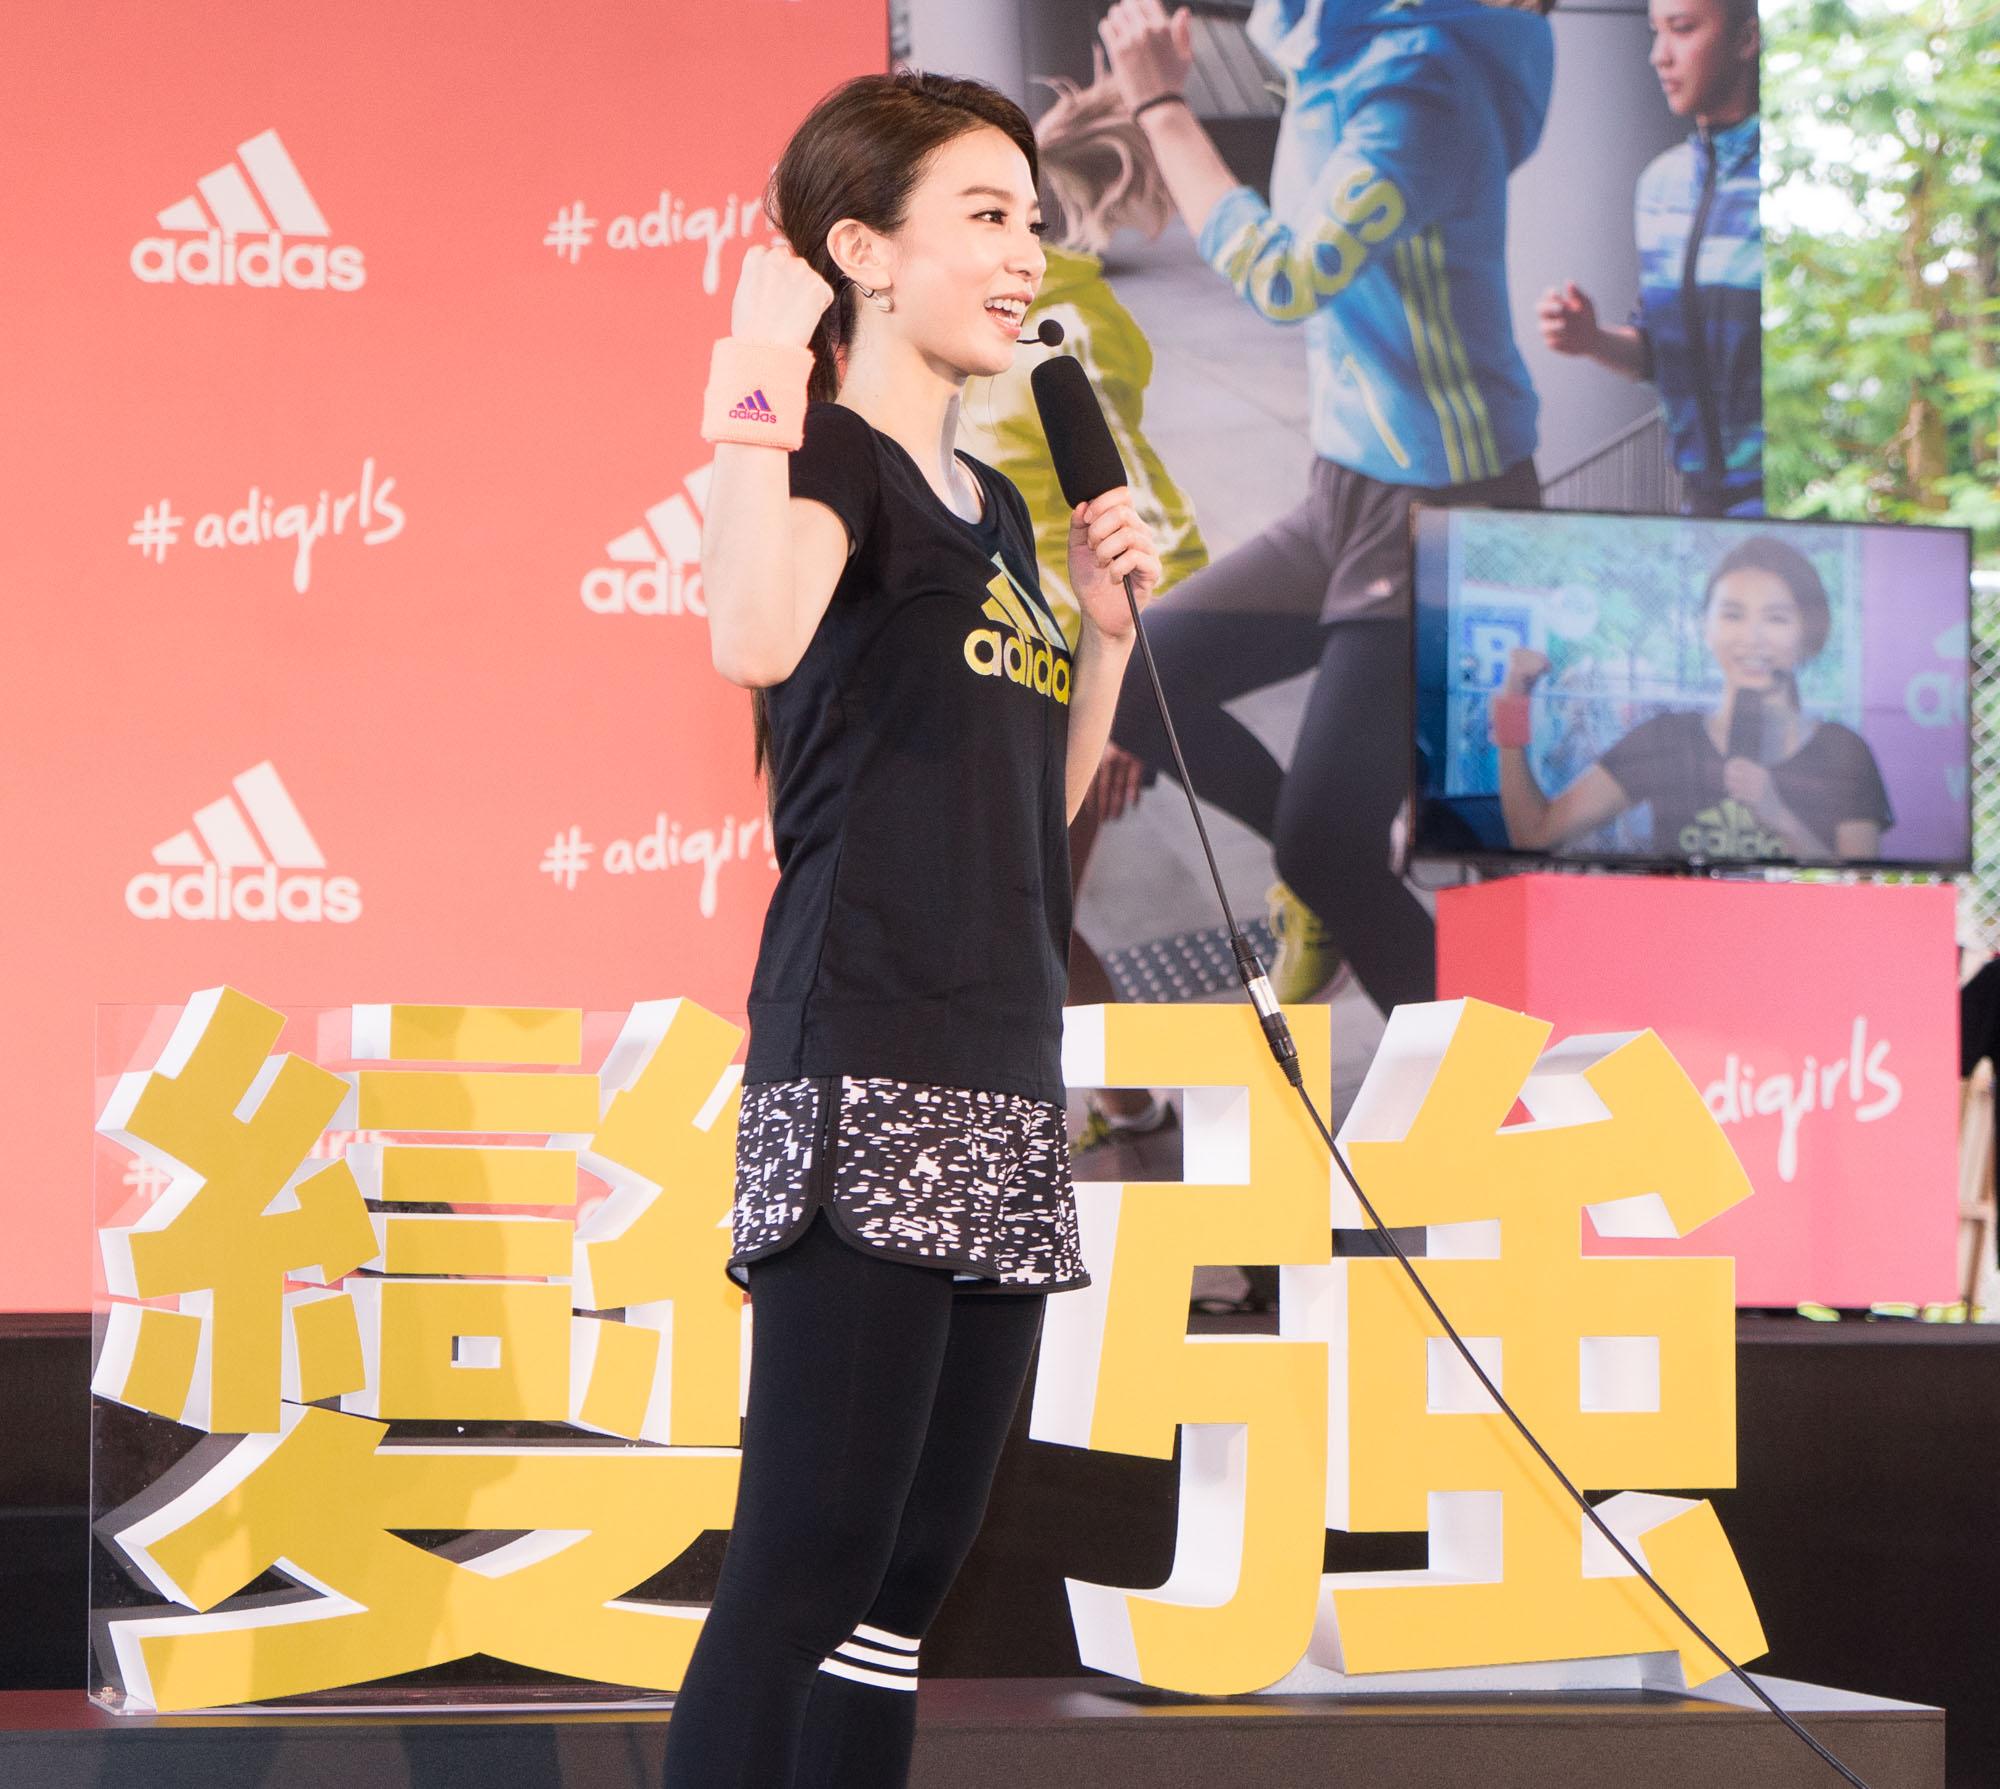 adidas-adigirls press conference 20150924-19